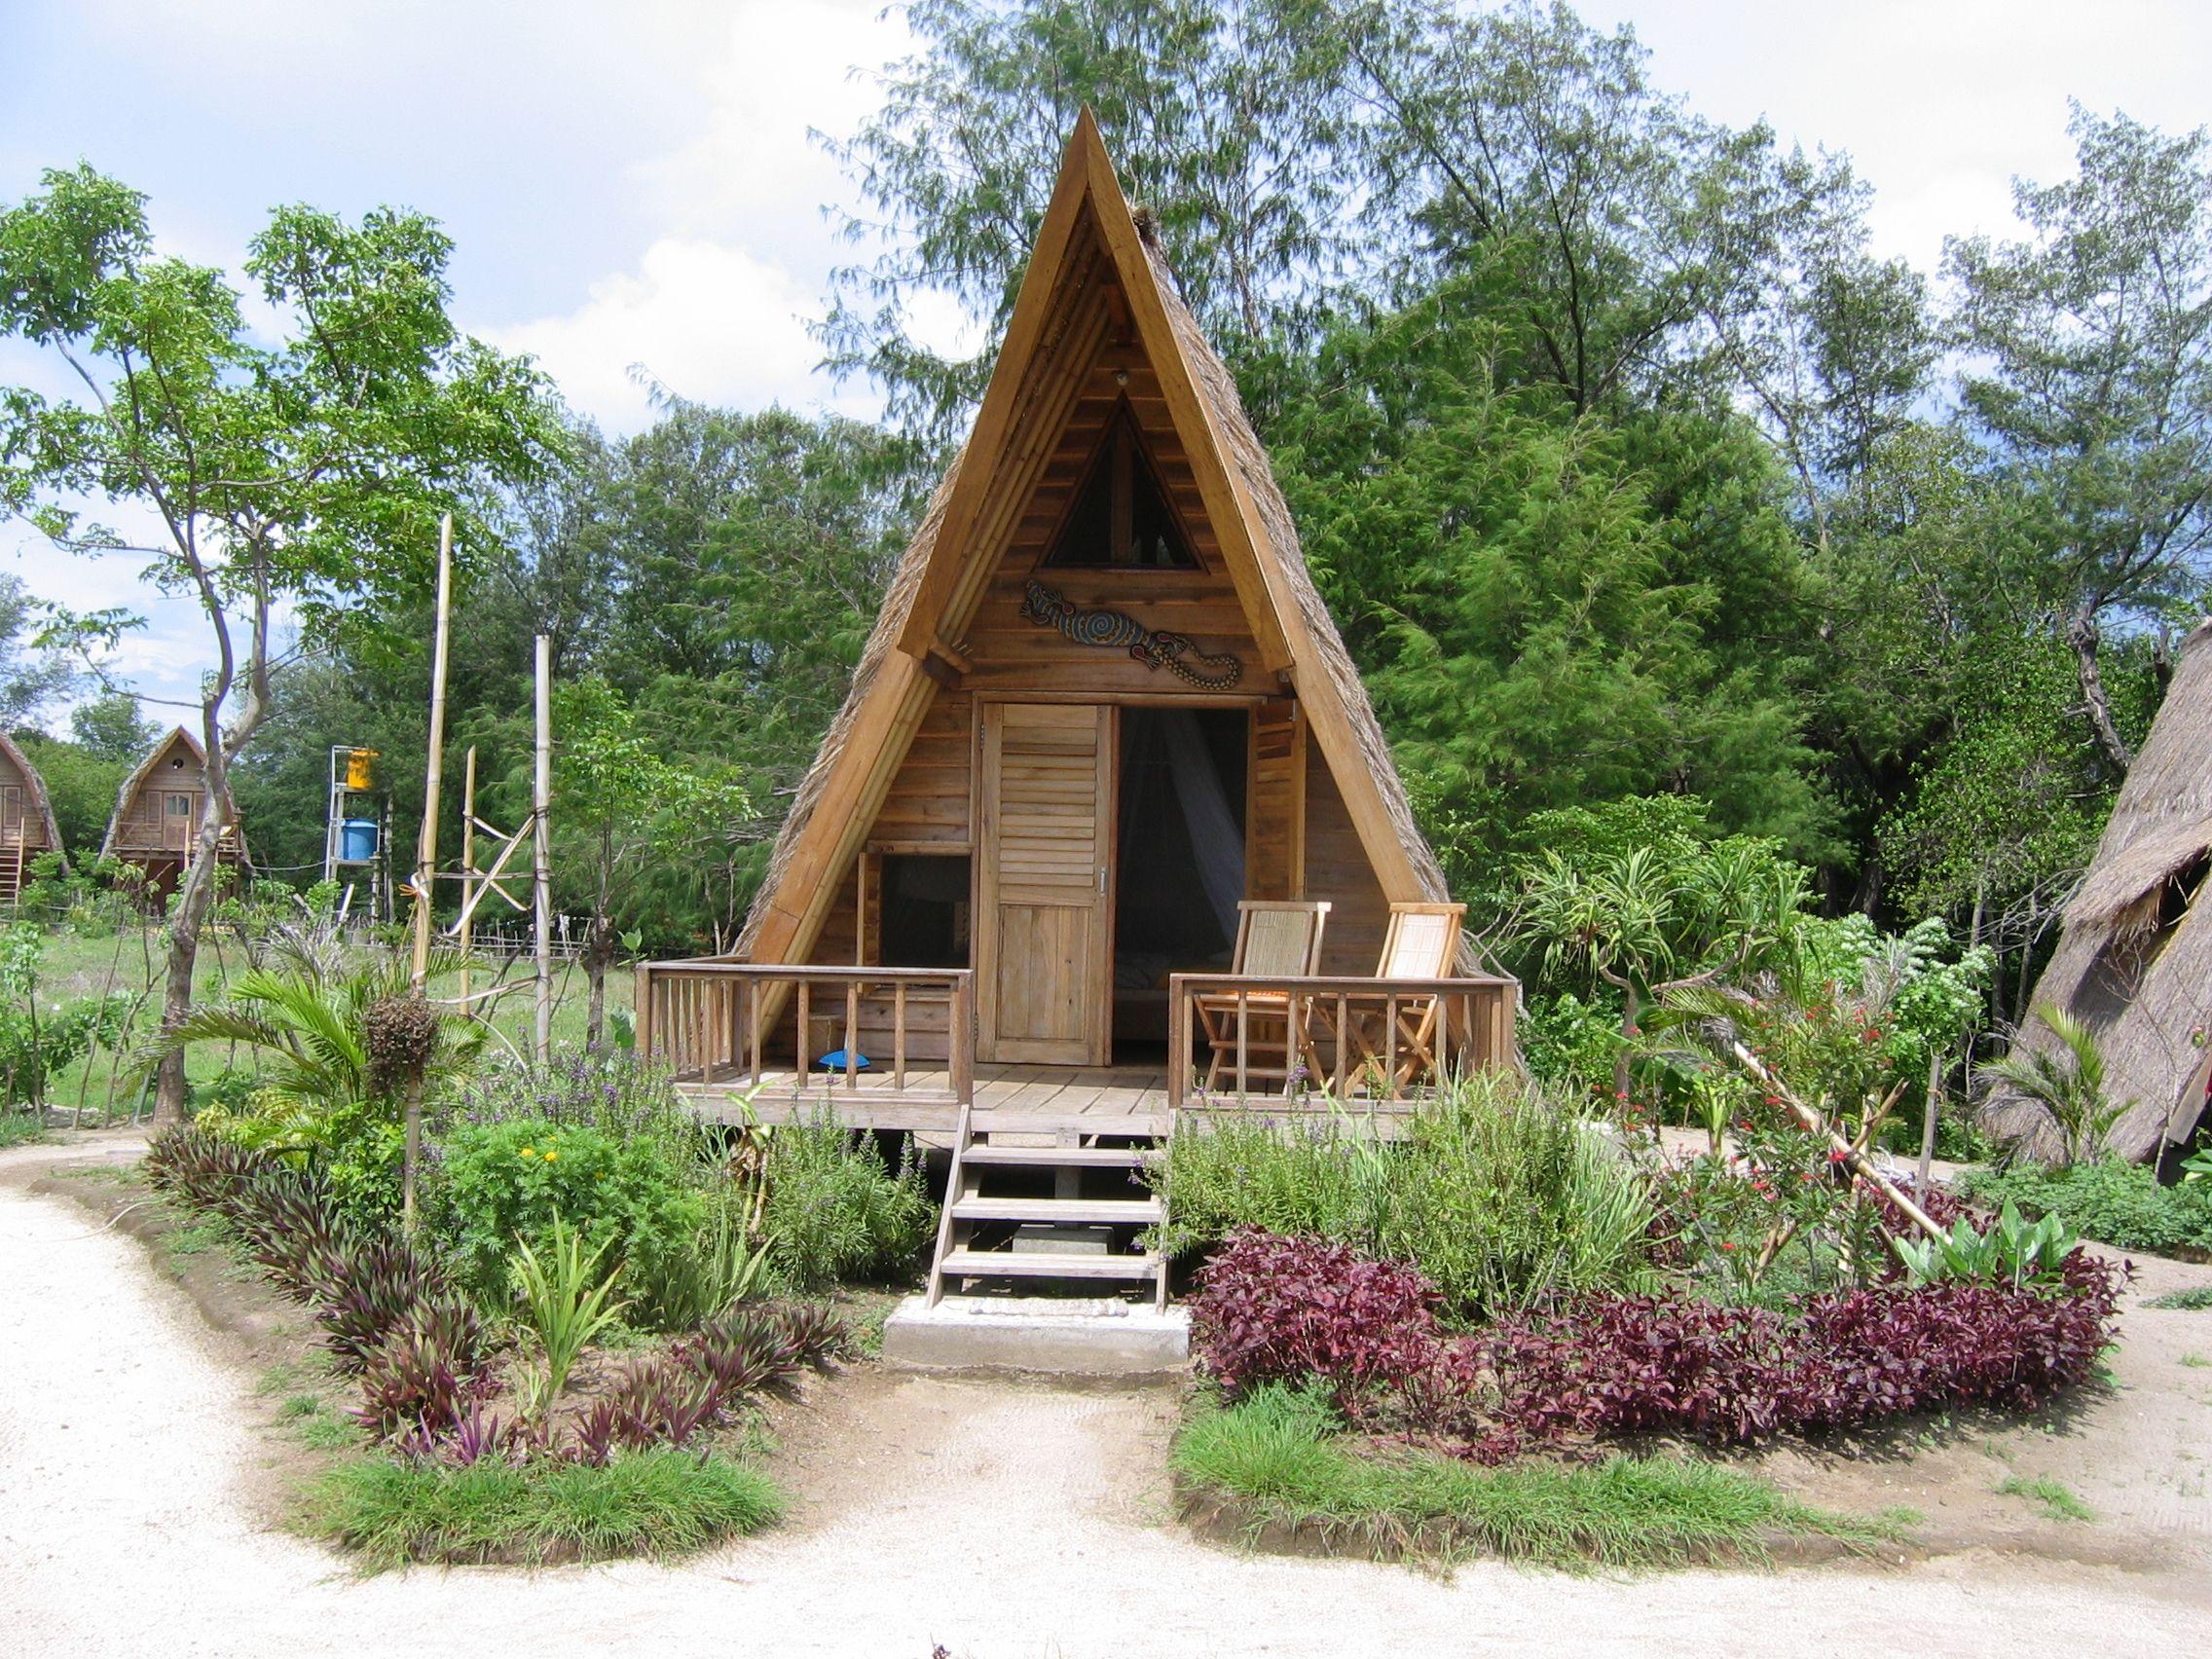 a frame bungalow | nicanica | Pinterest